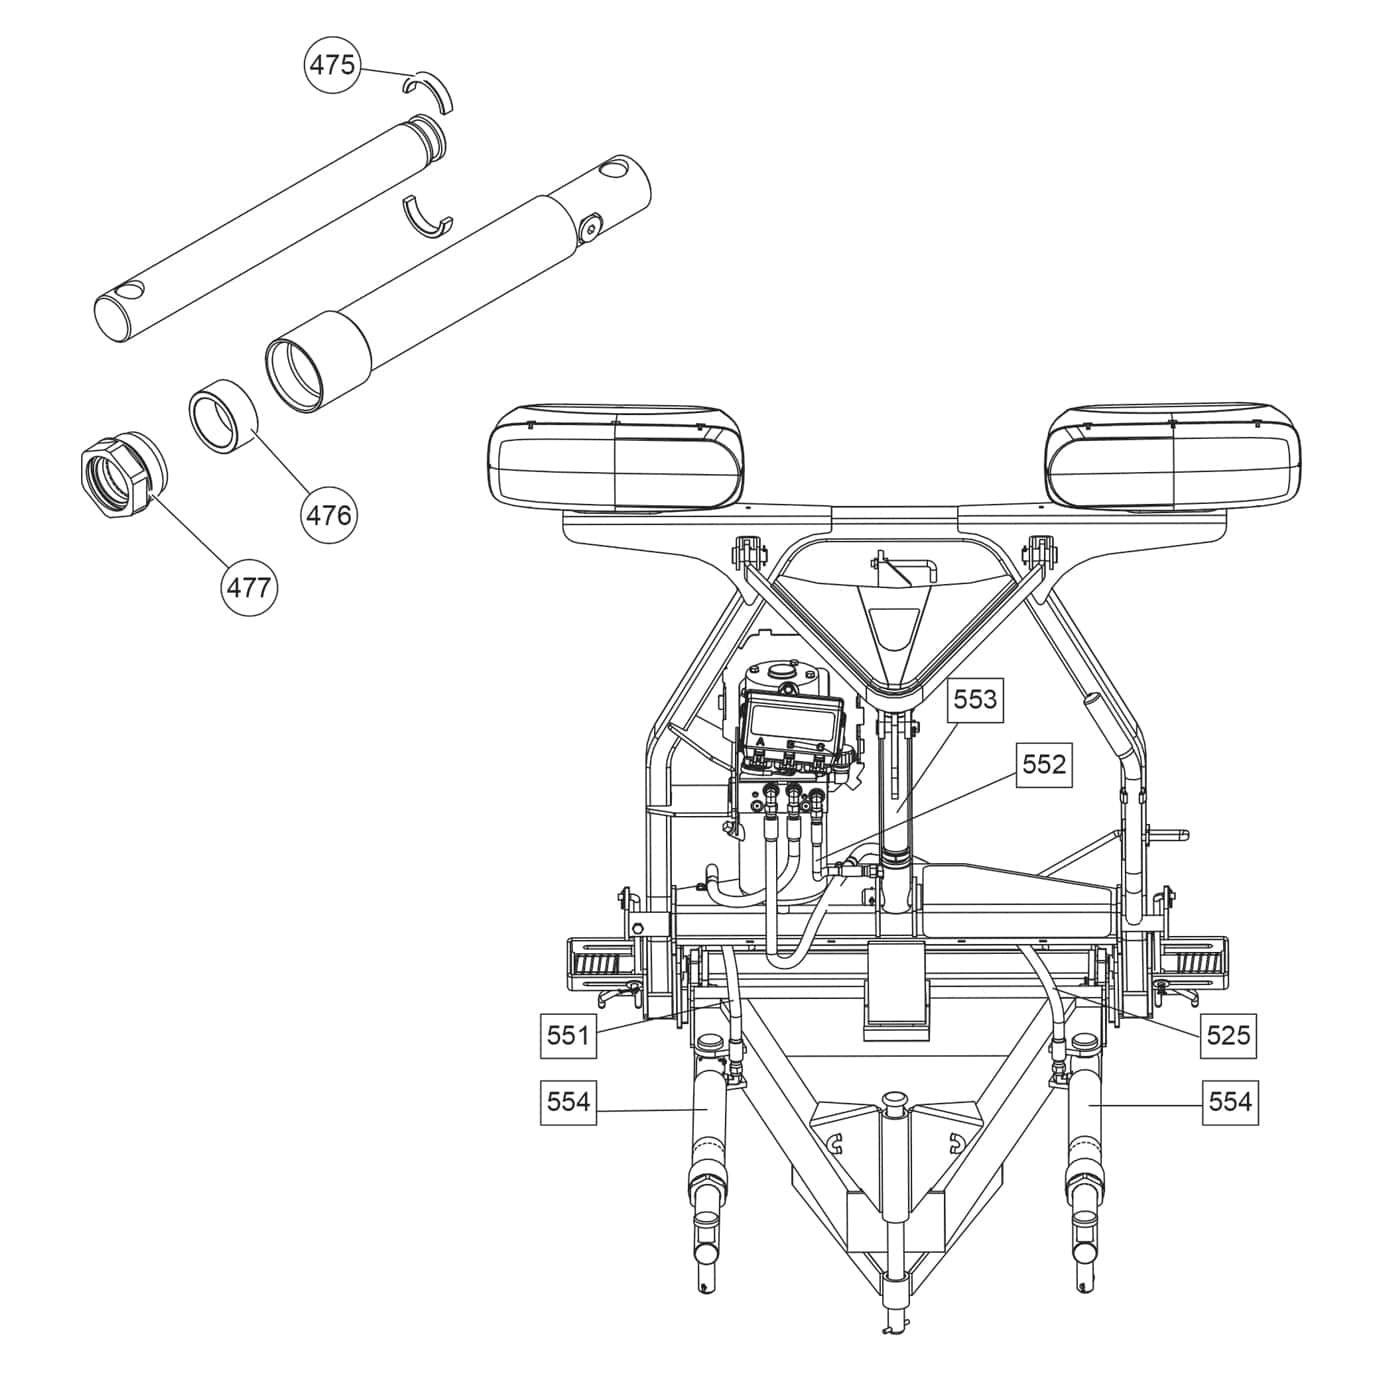 Snow Dogg Wiring Diagram Snowex Wiring Diagram Wiring